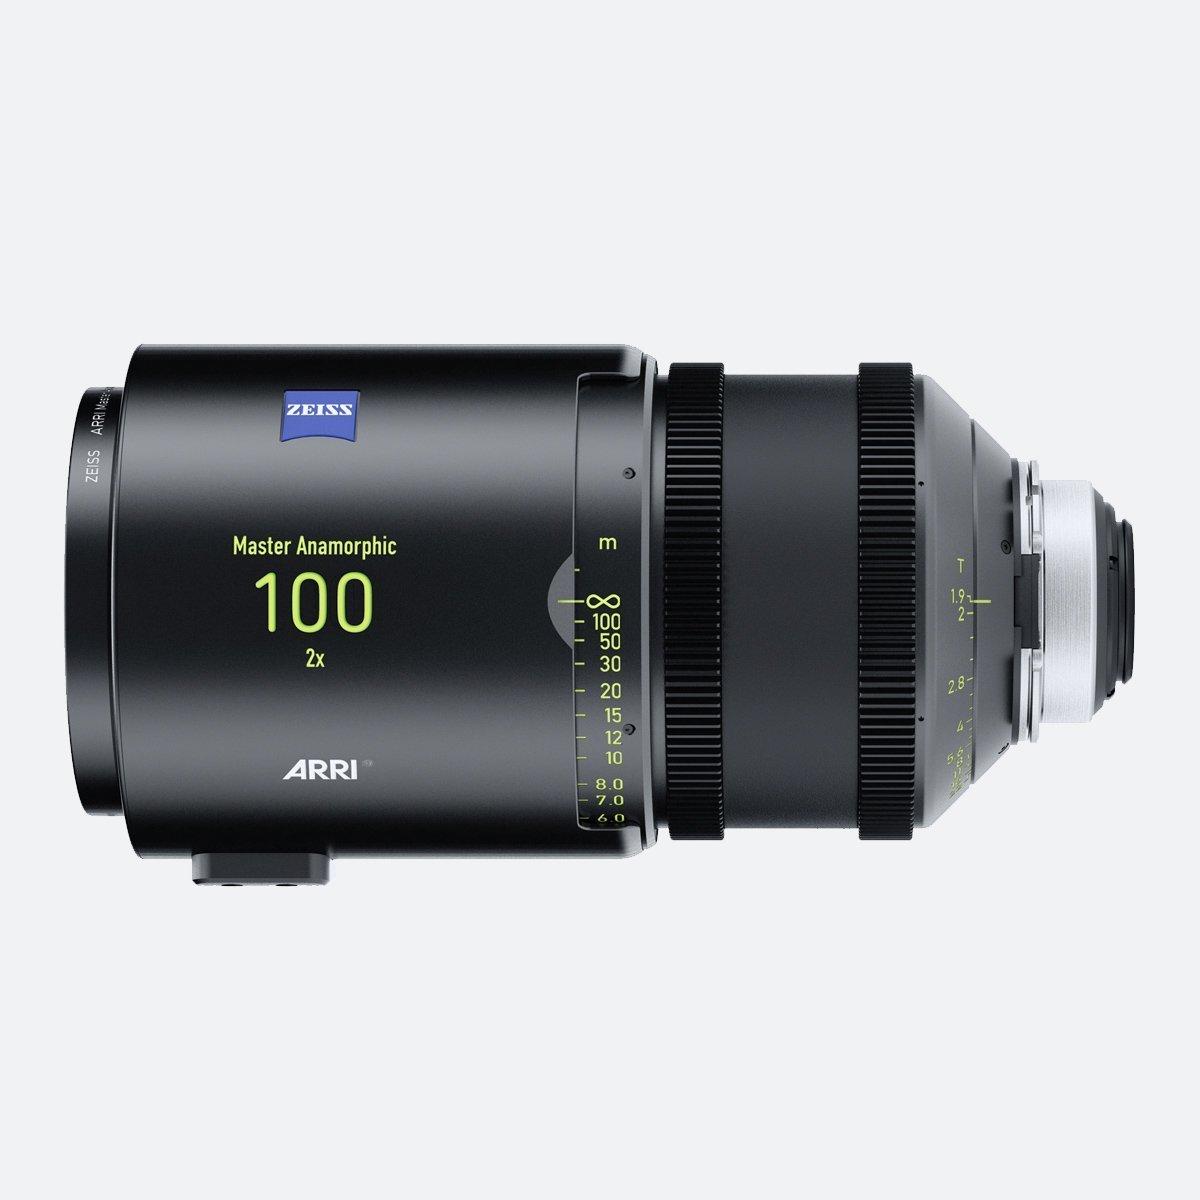 ARRI 100mm T1.9 Master Anamorphic Lens